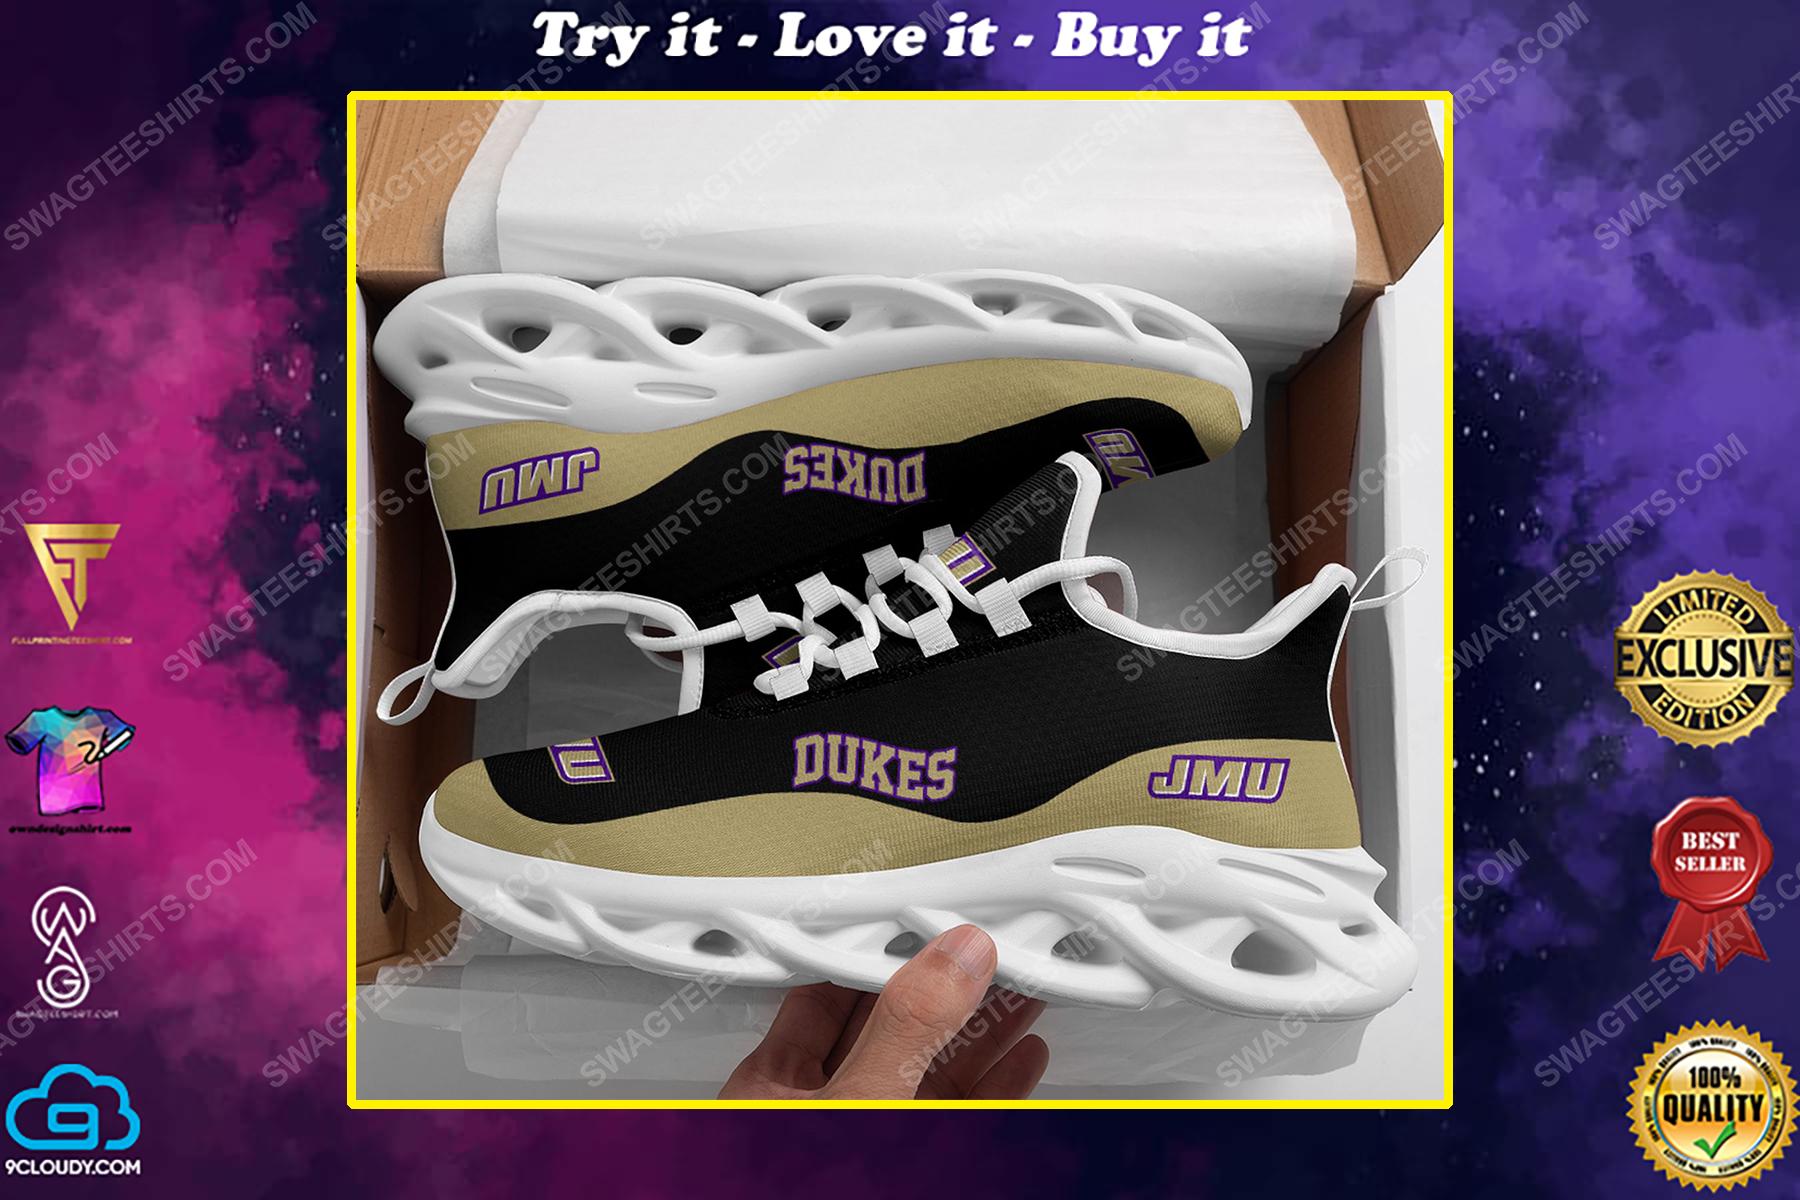 The james madison dukes football team max soul shoes